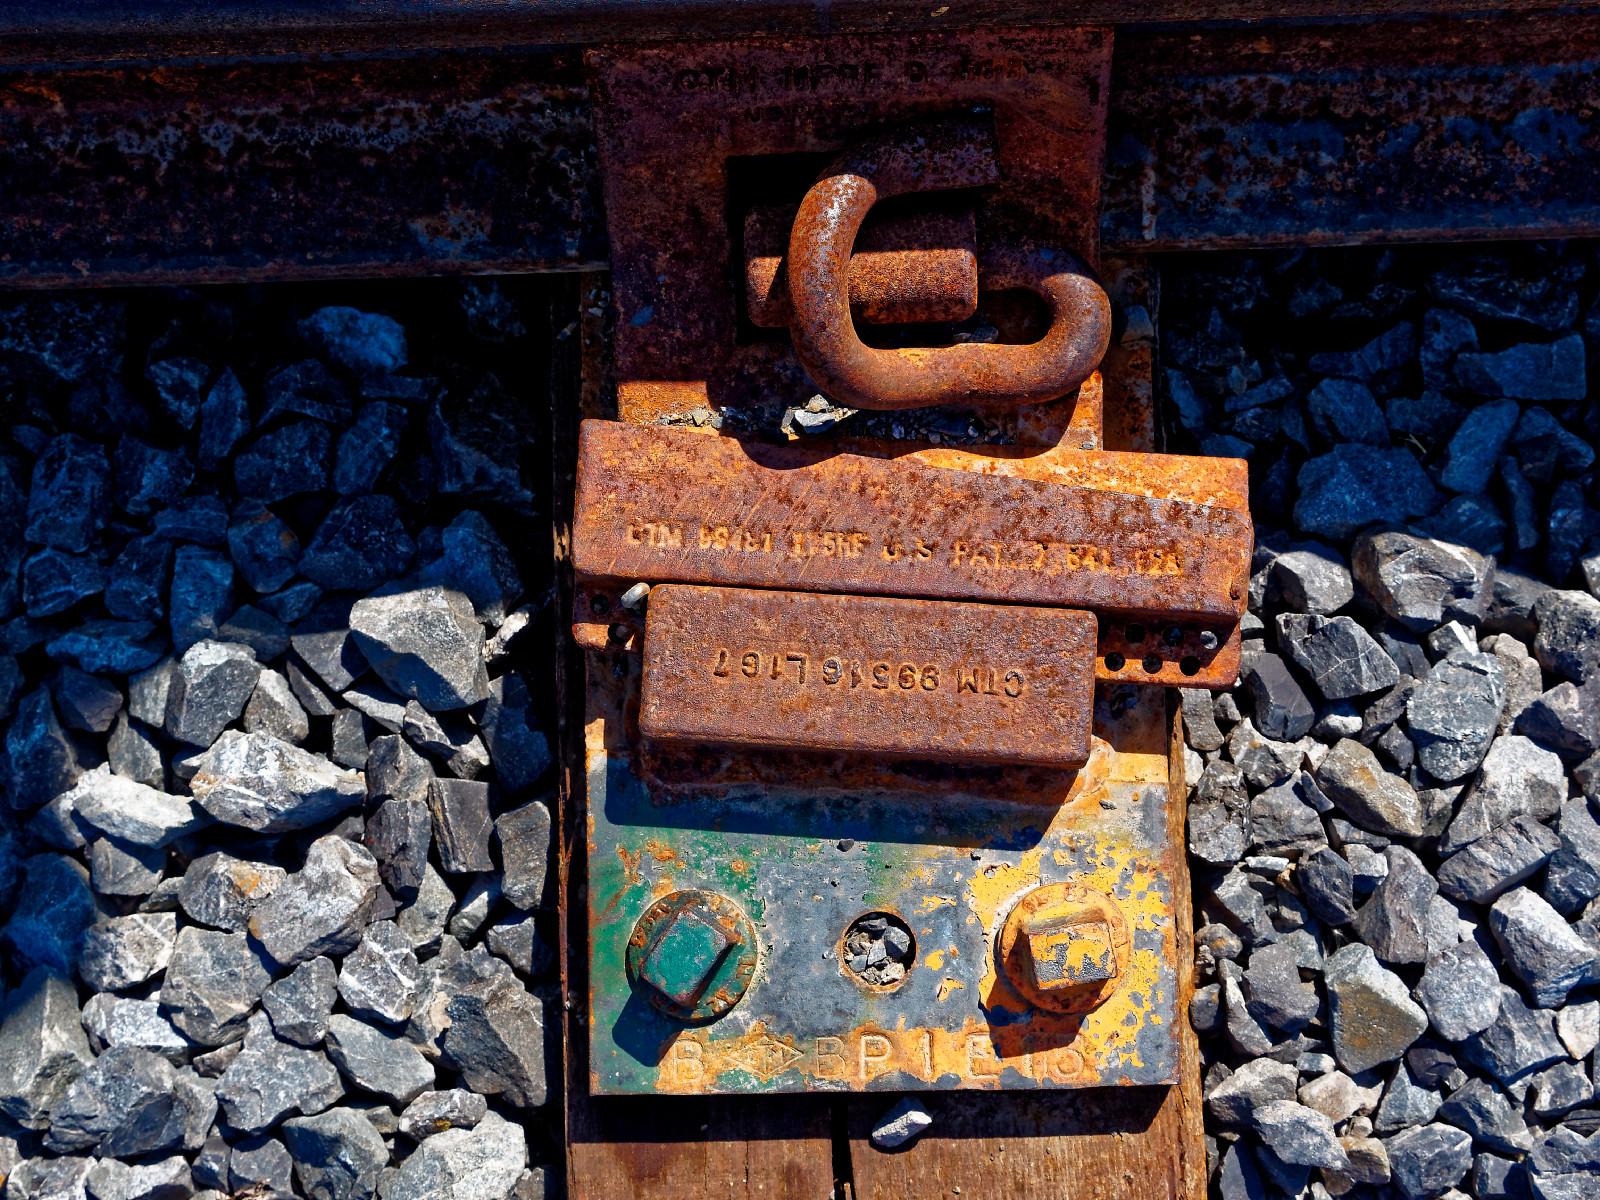 http://thedigitalstory.com/2015/09/02/railroad-web-d-story.jpg